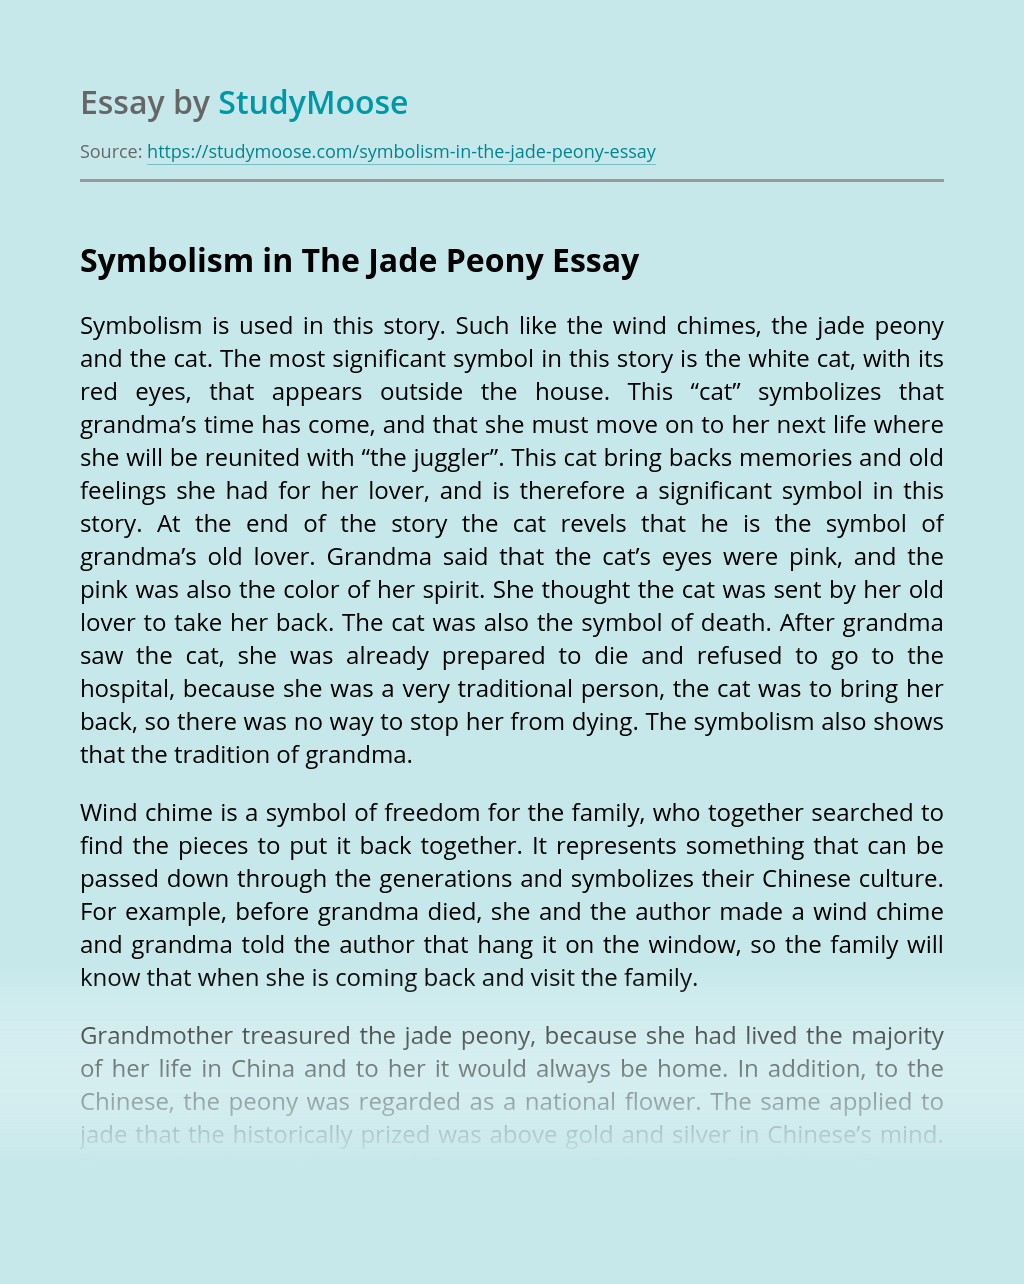 Symbolism in The Jade Peony